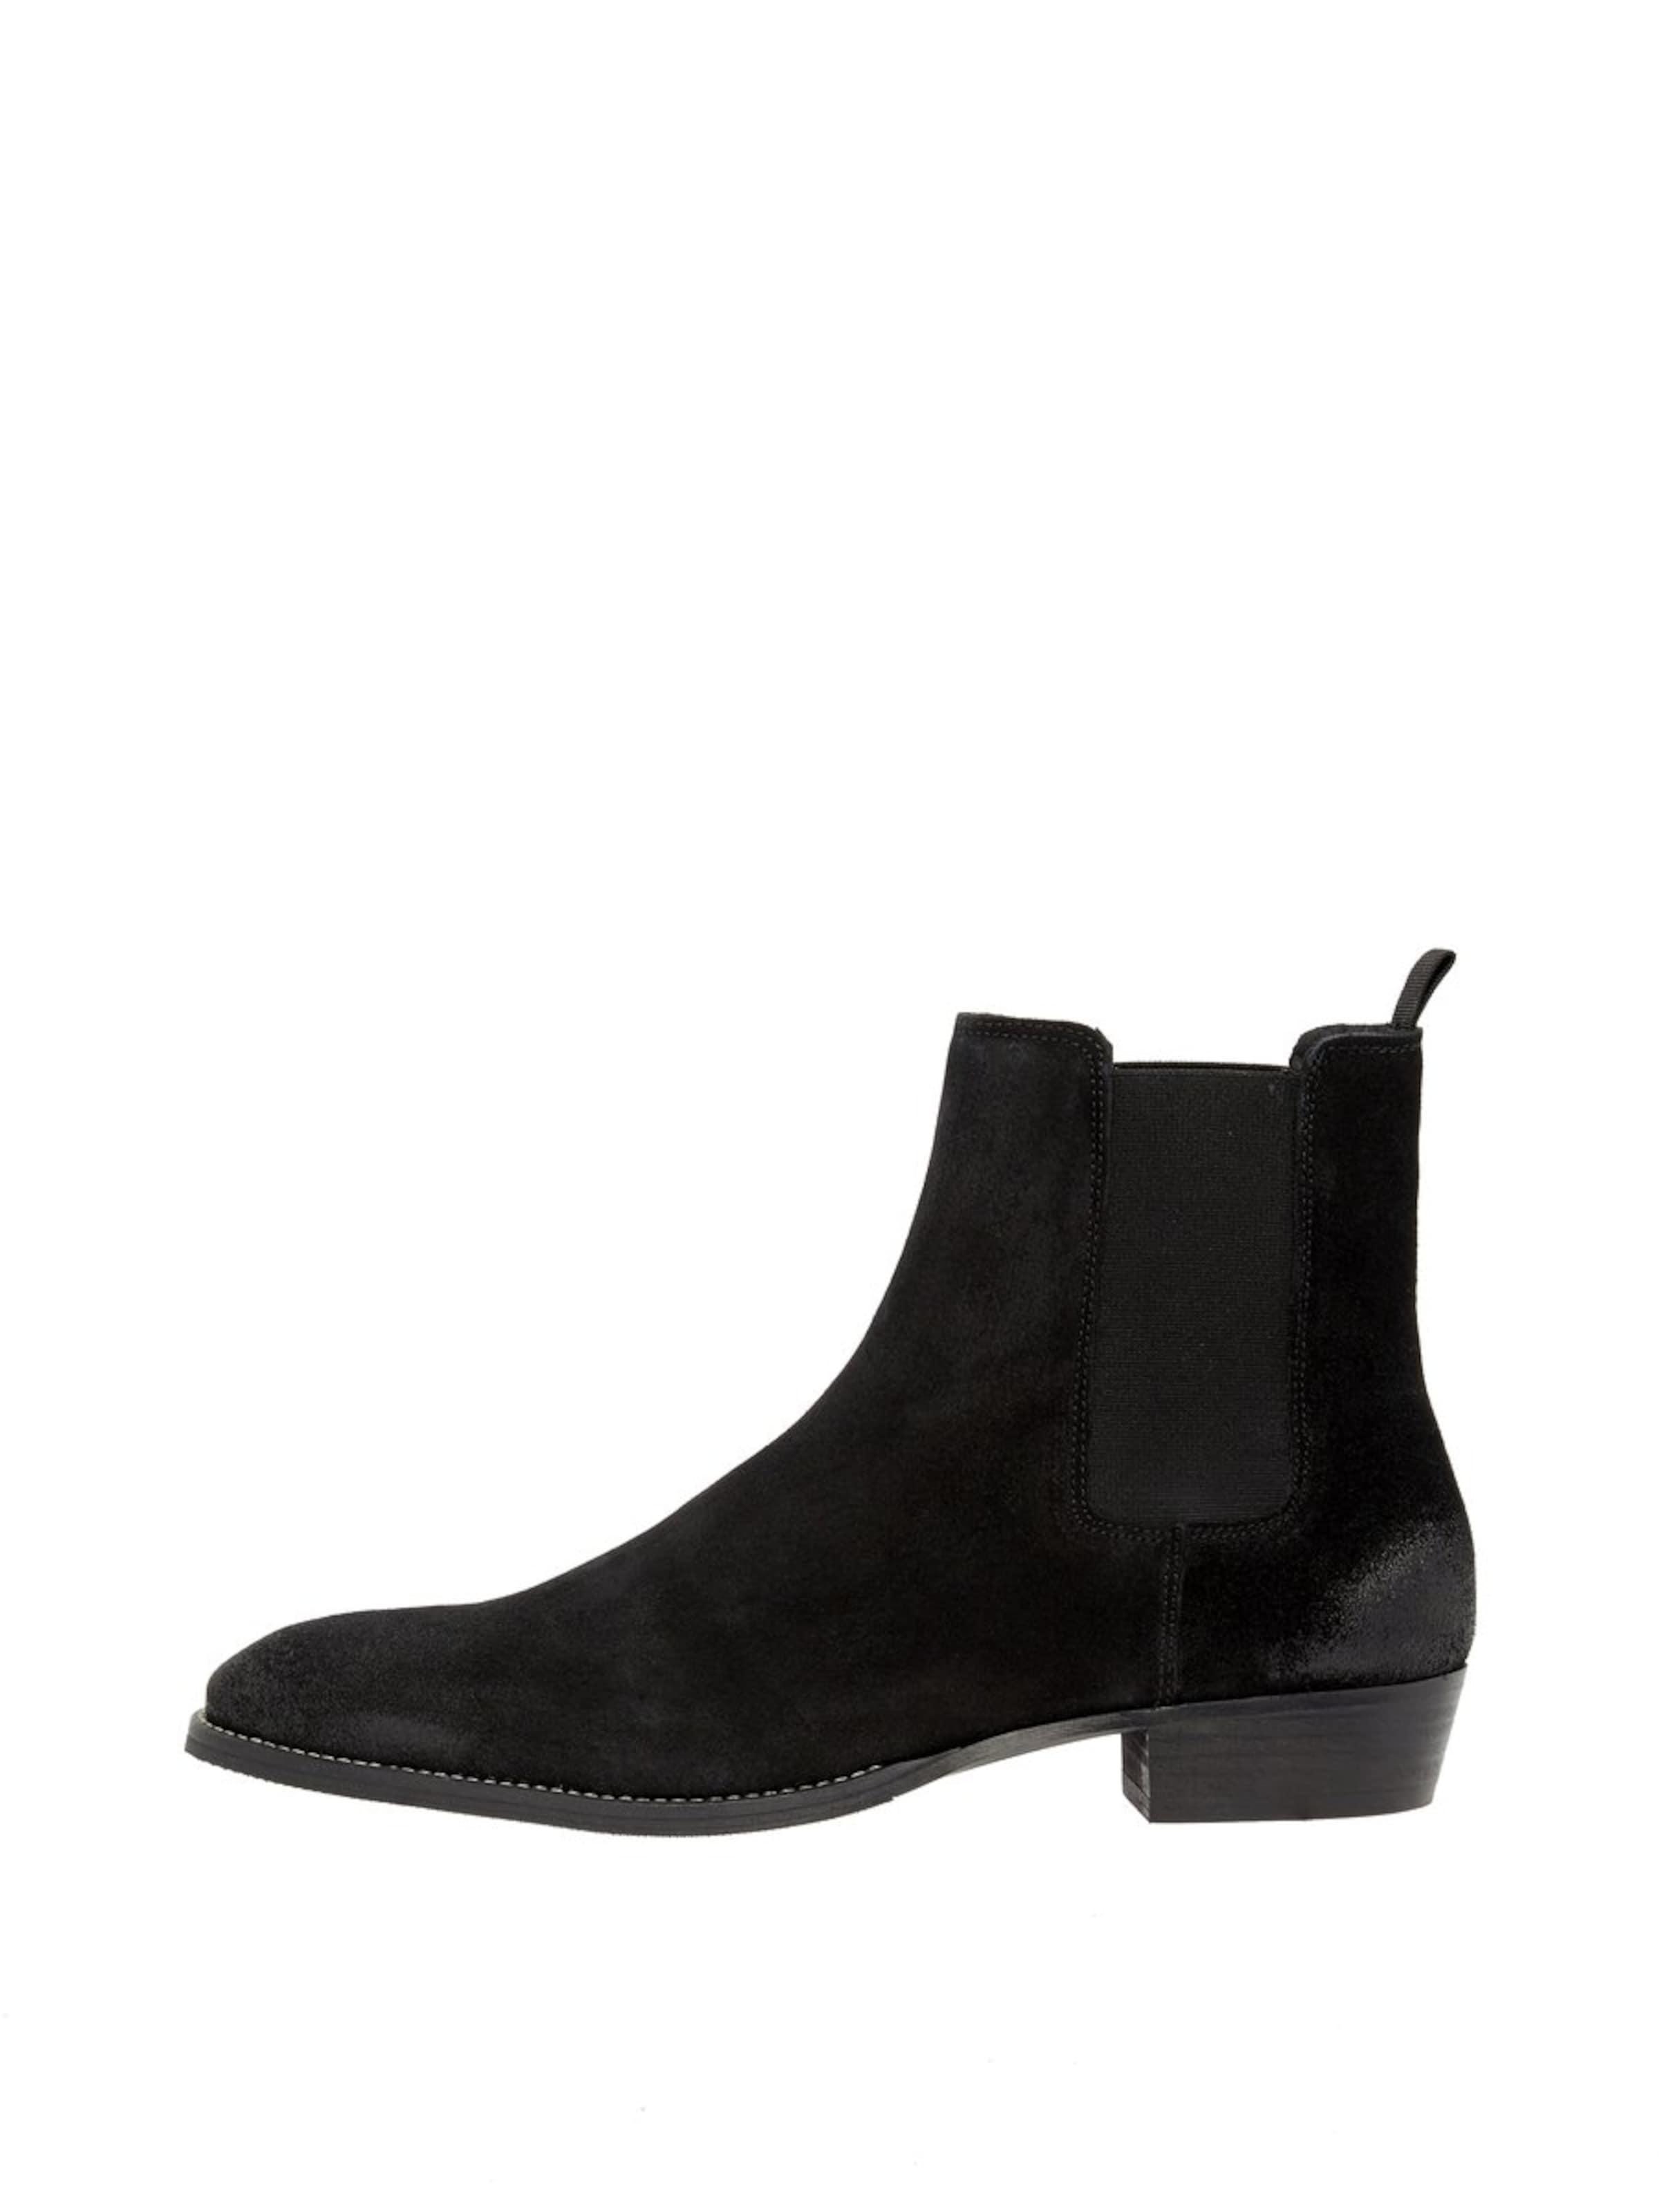 'beack' Bianco Noir Boots Chelsea En tQBxshrdoC